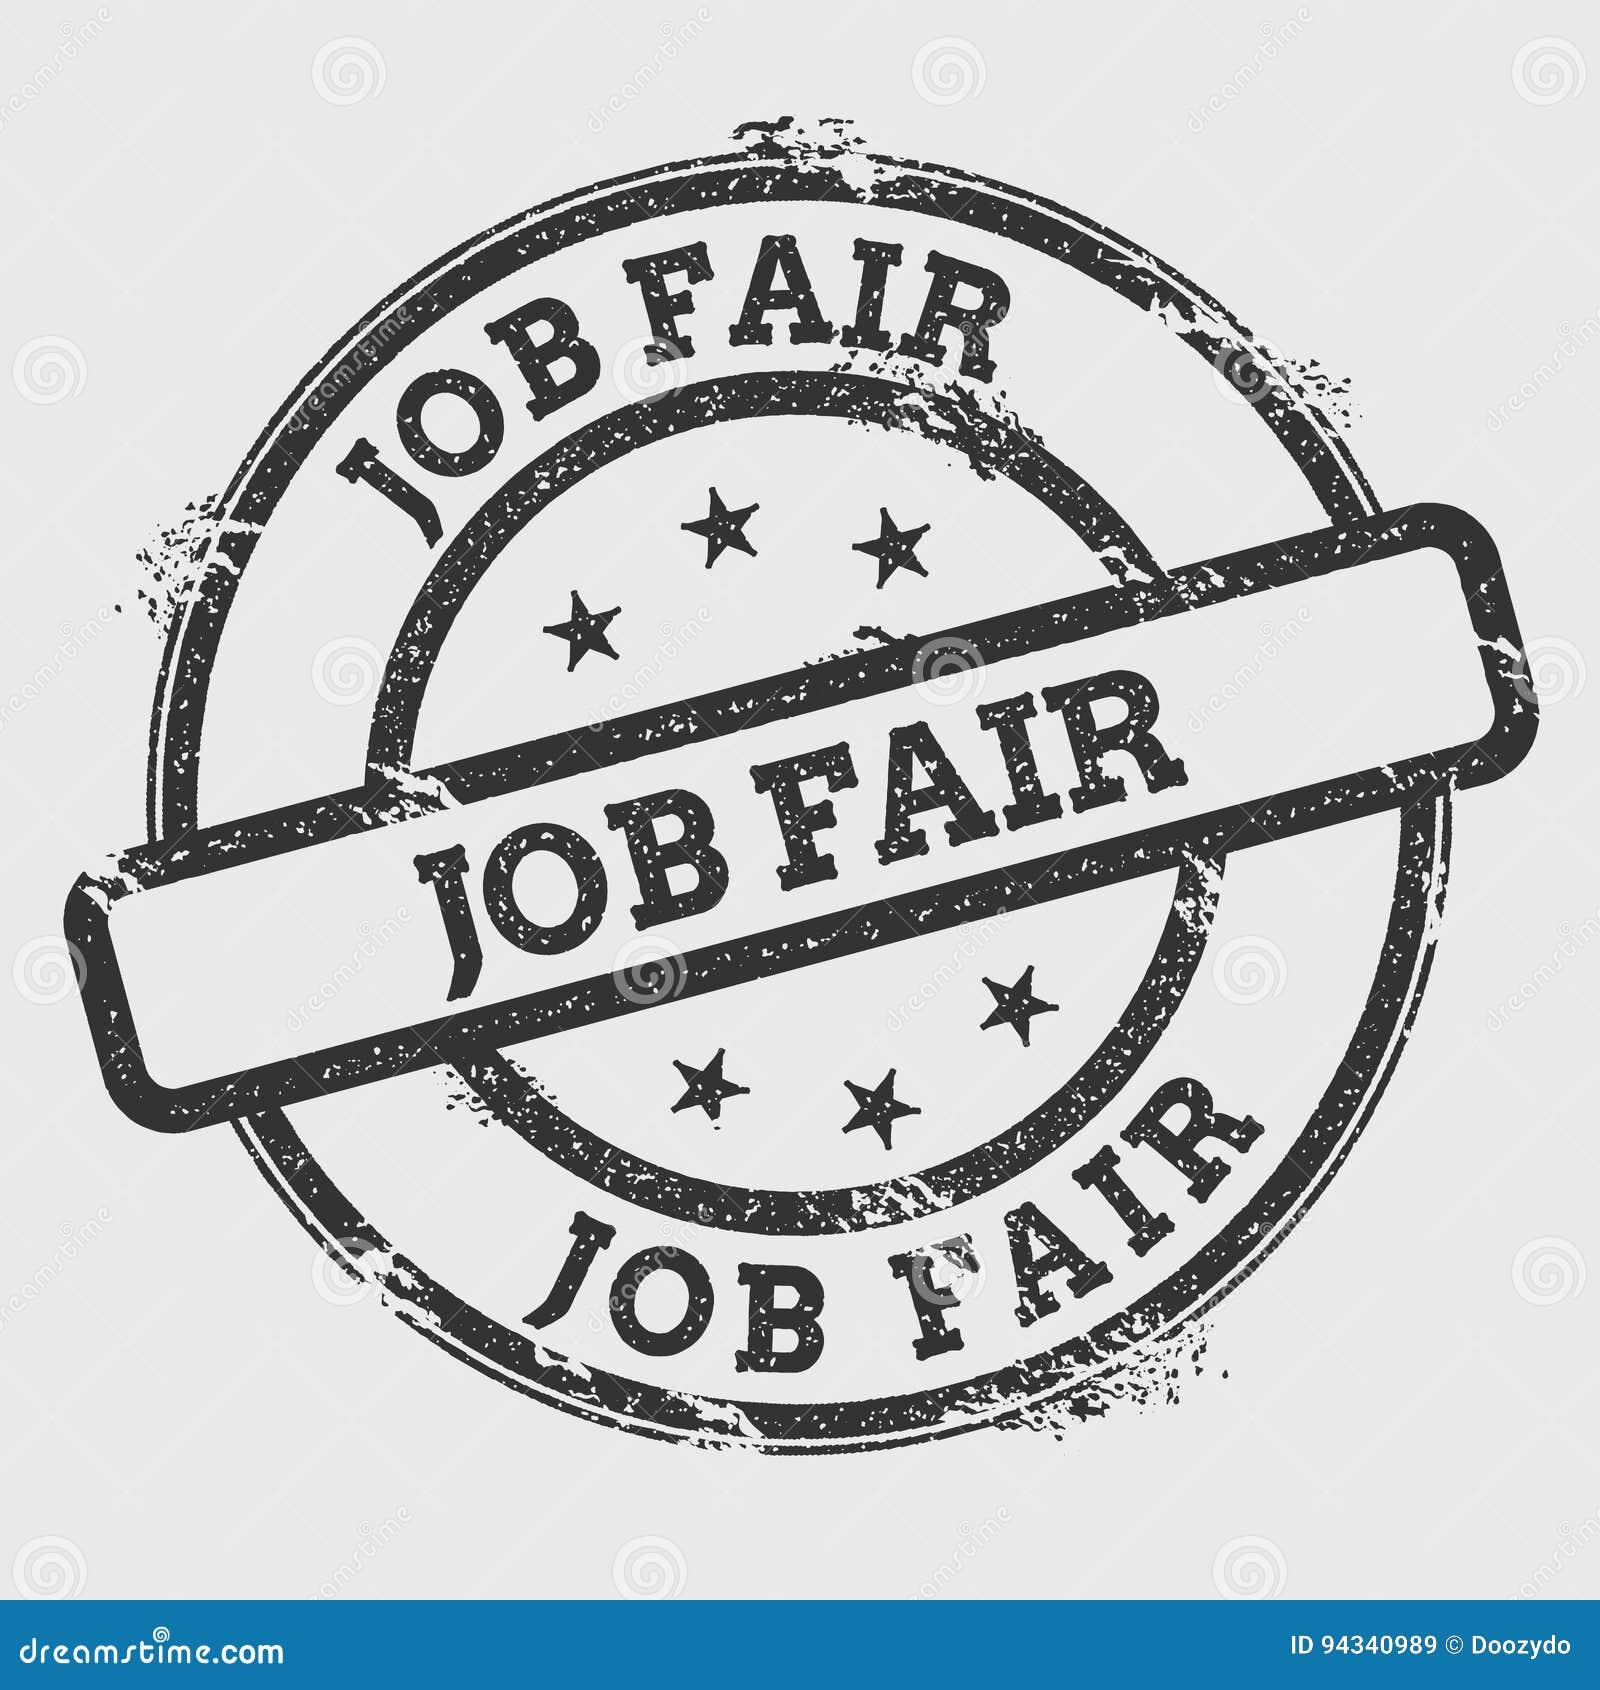 Job fair rubber stamp on white.